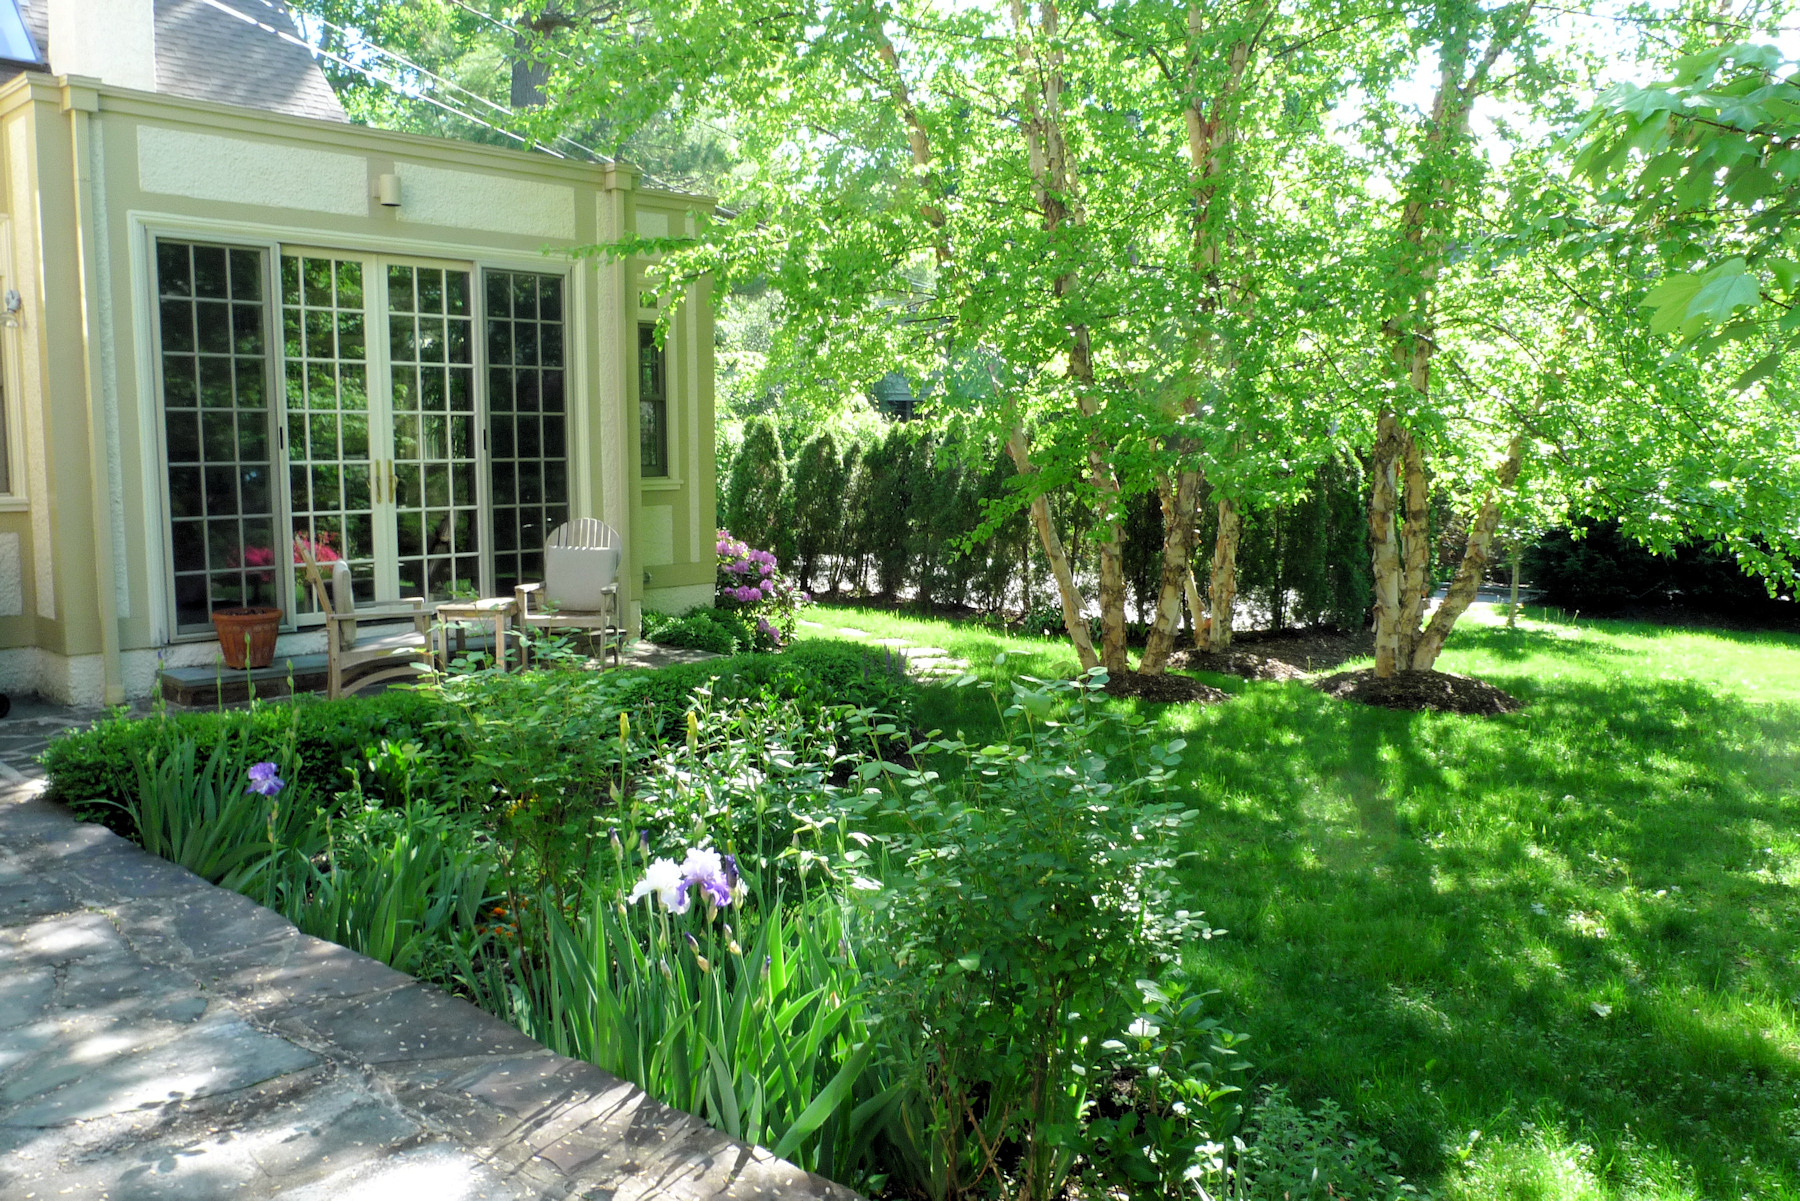 27 Marvelous Landscape Design That Benefits The Environment U2013 Izvipi.com